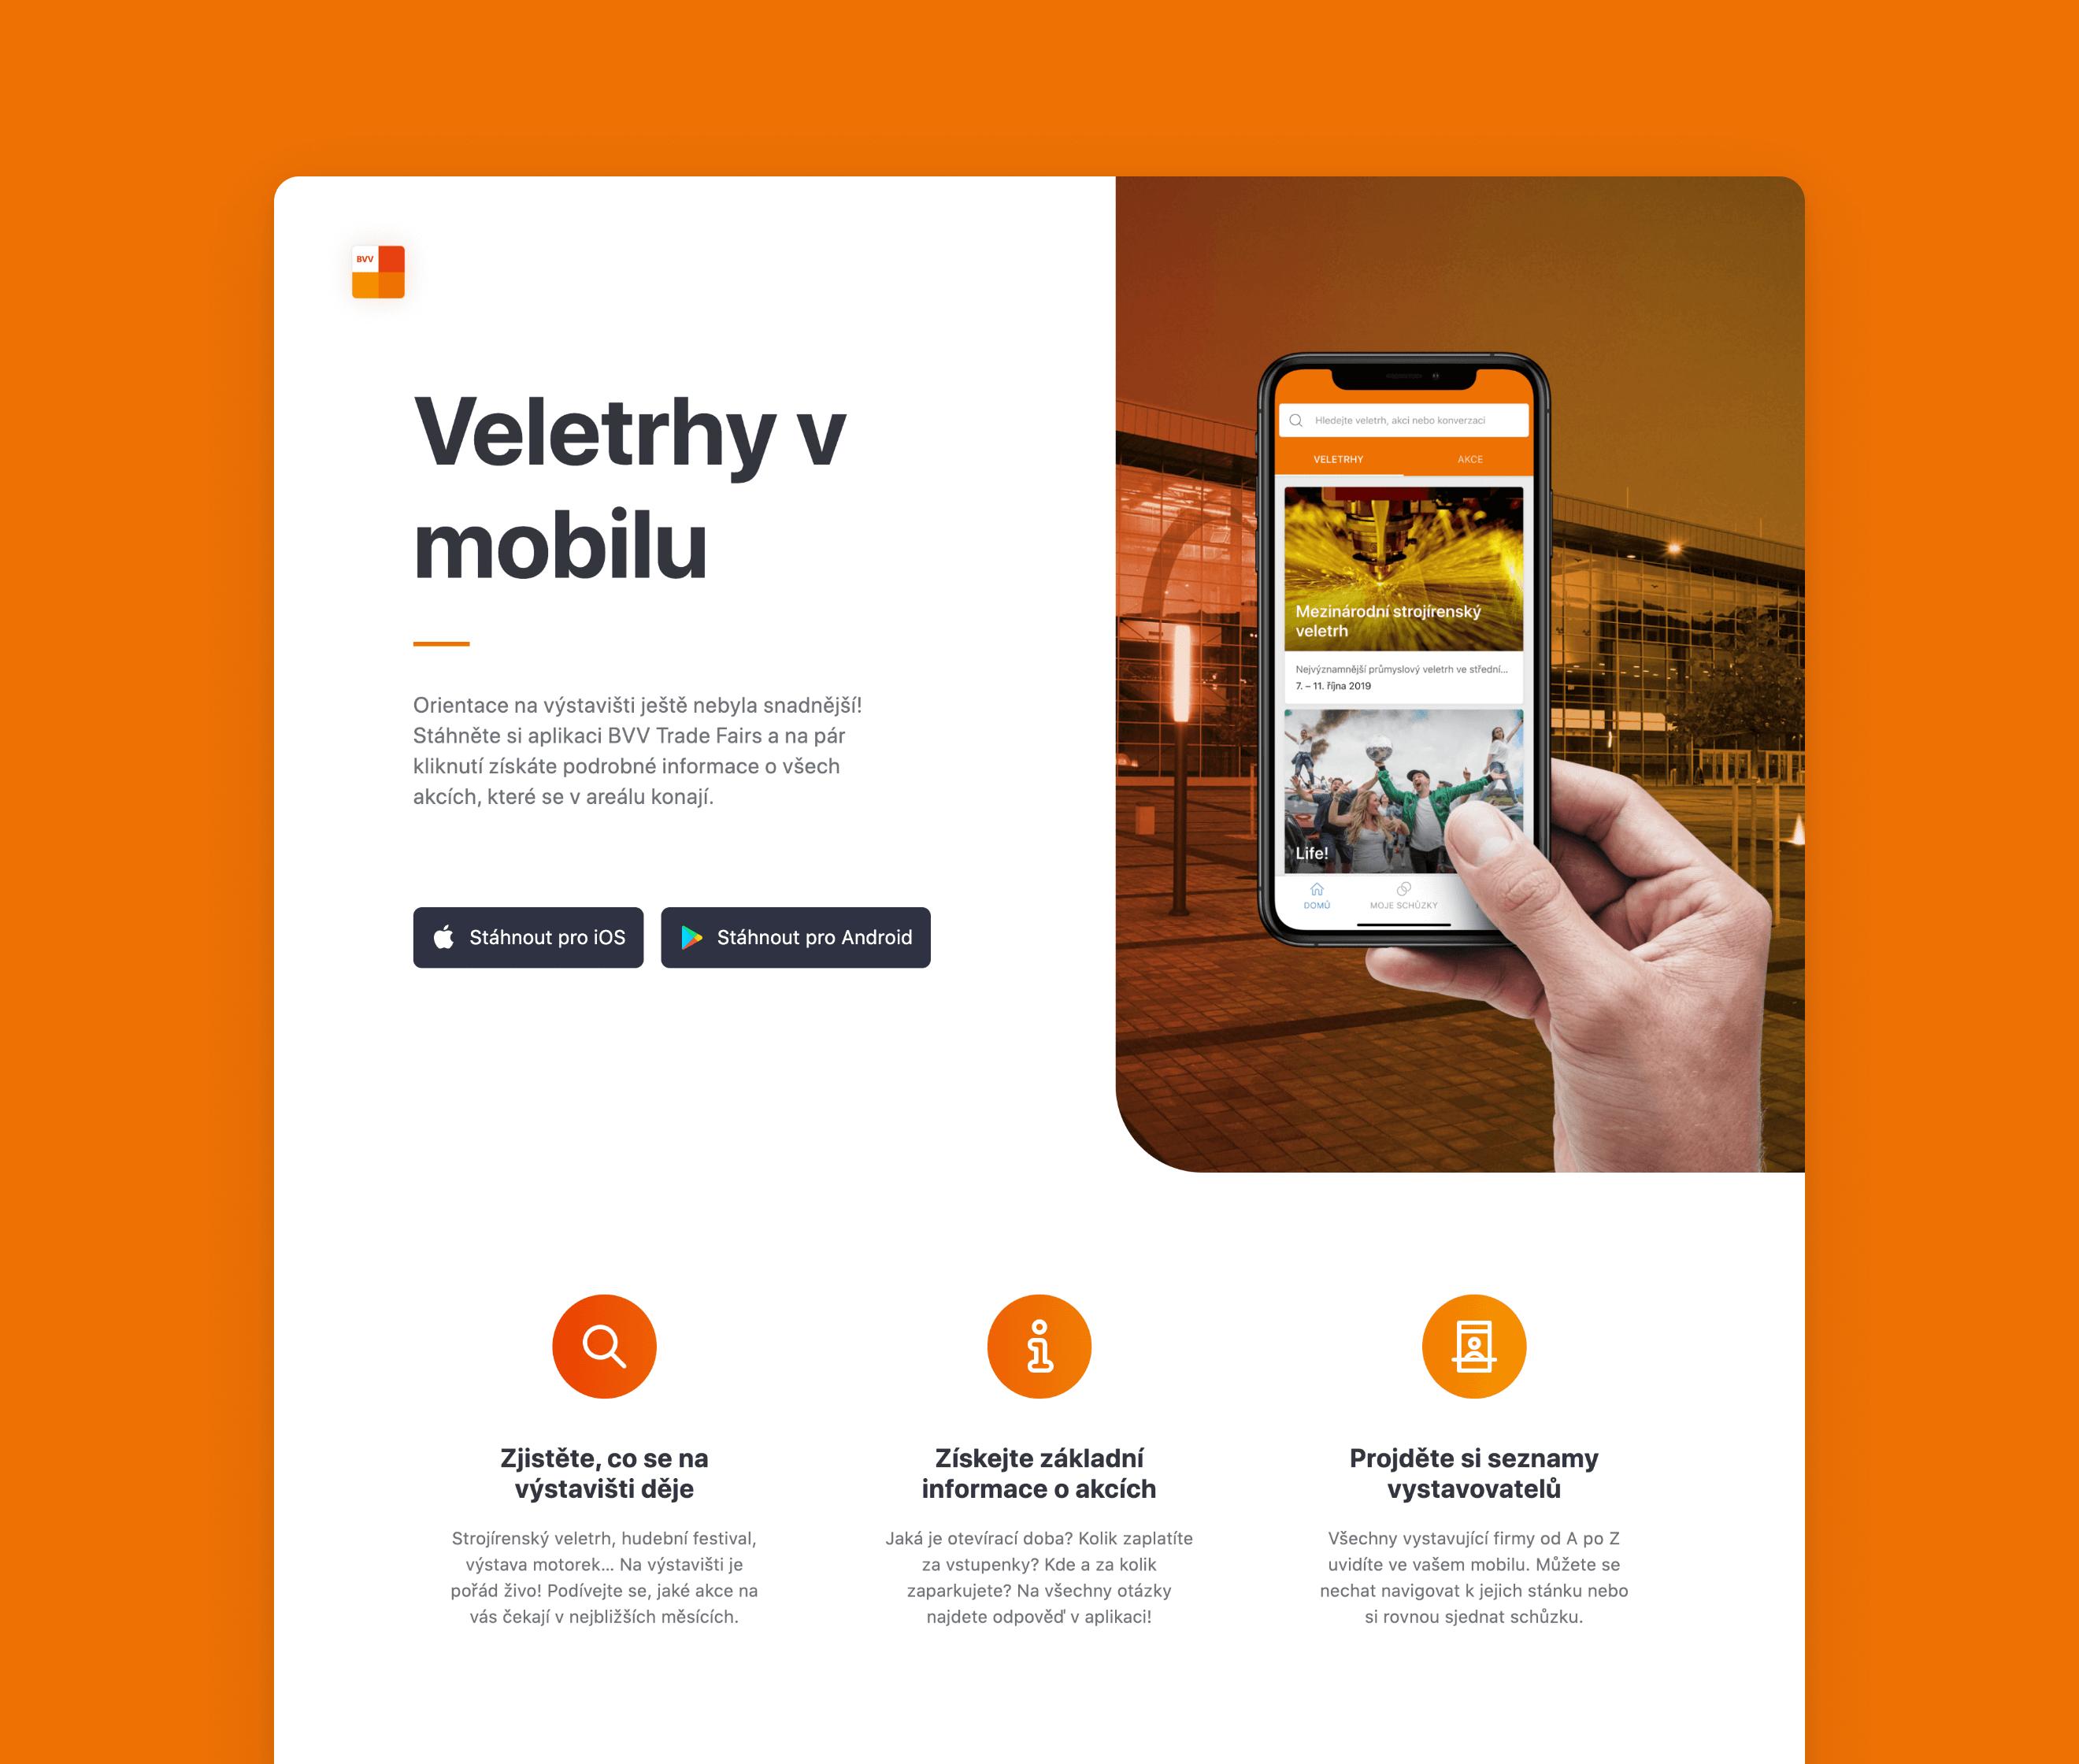 Informační stránka o aplikaci